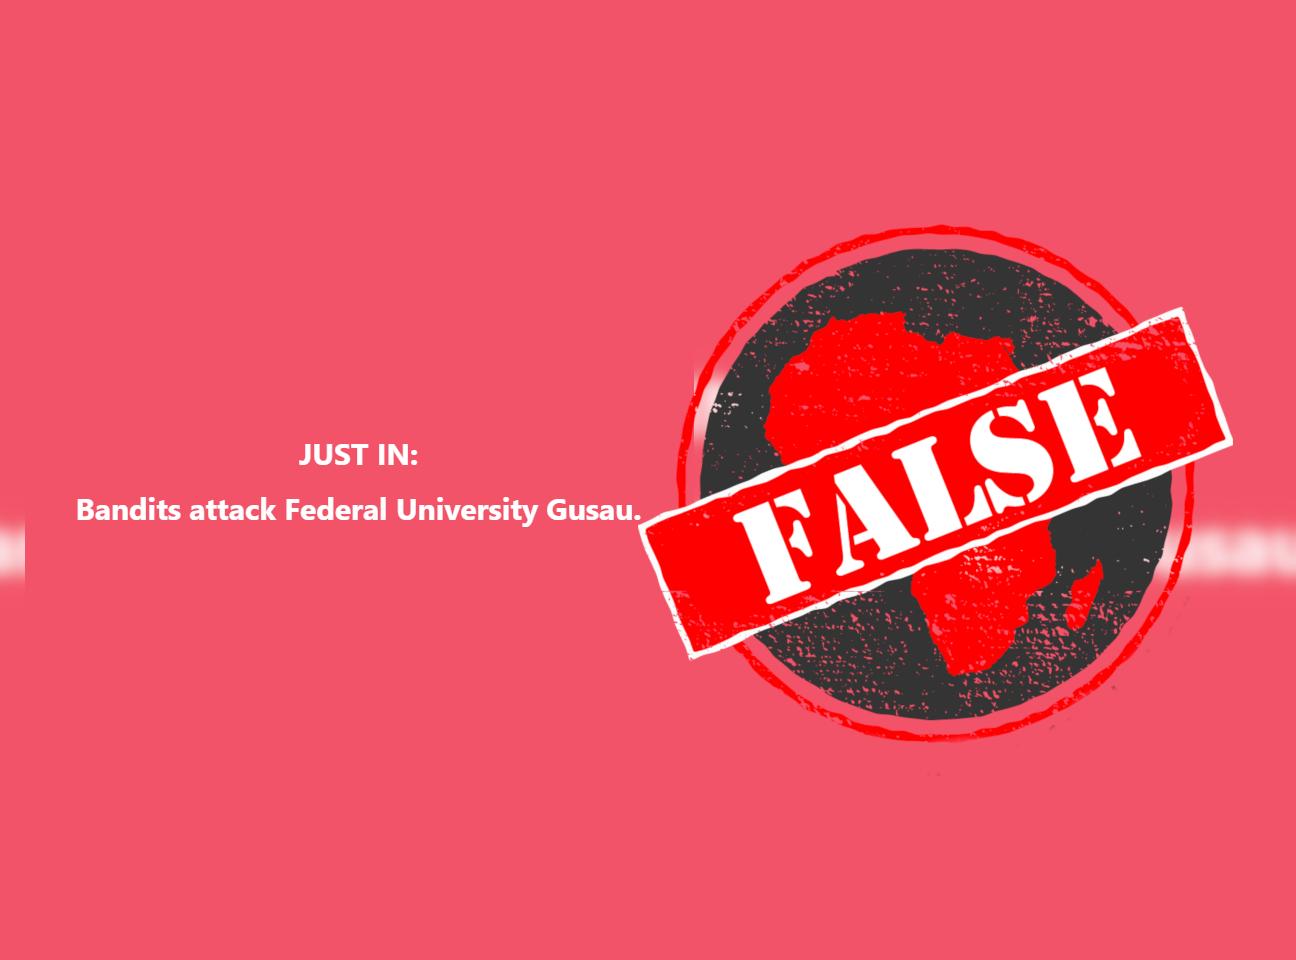 Attack_False